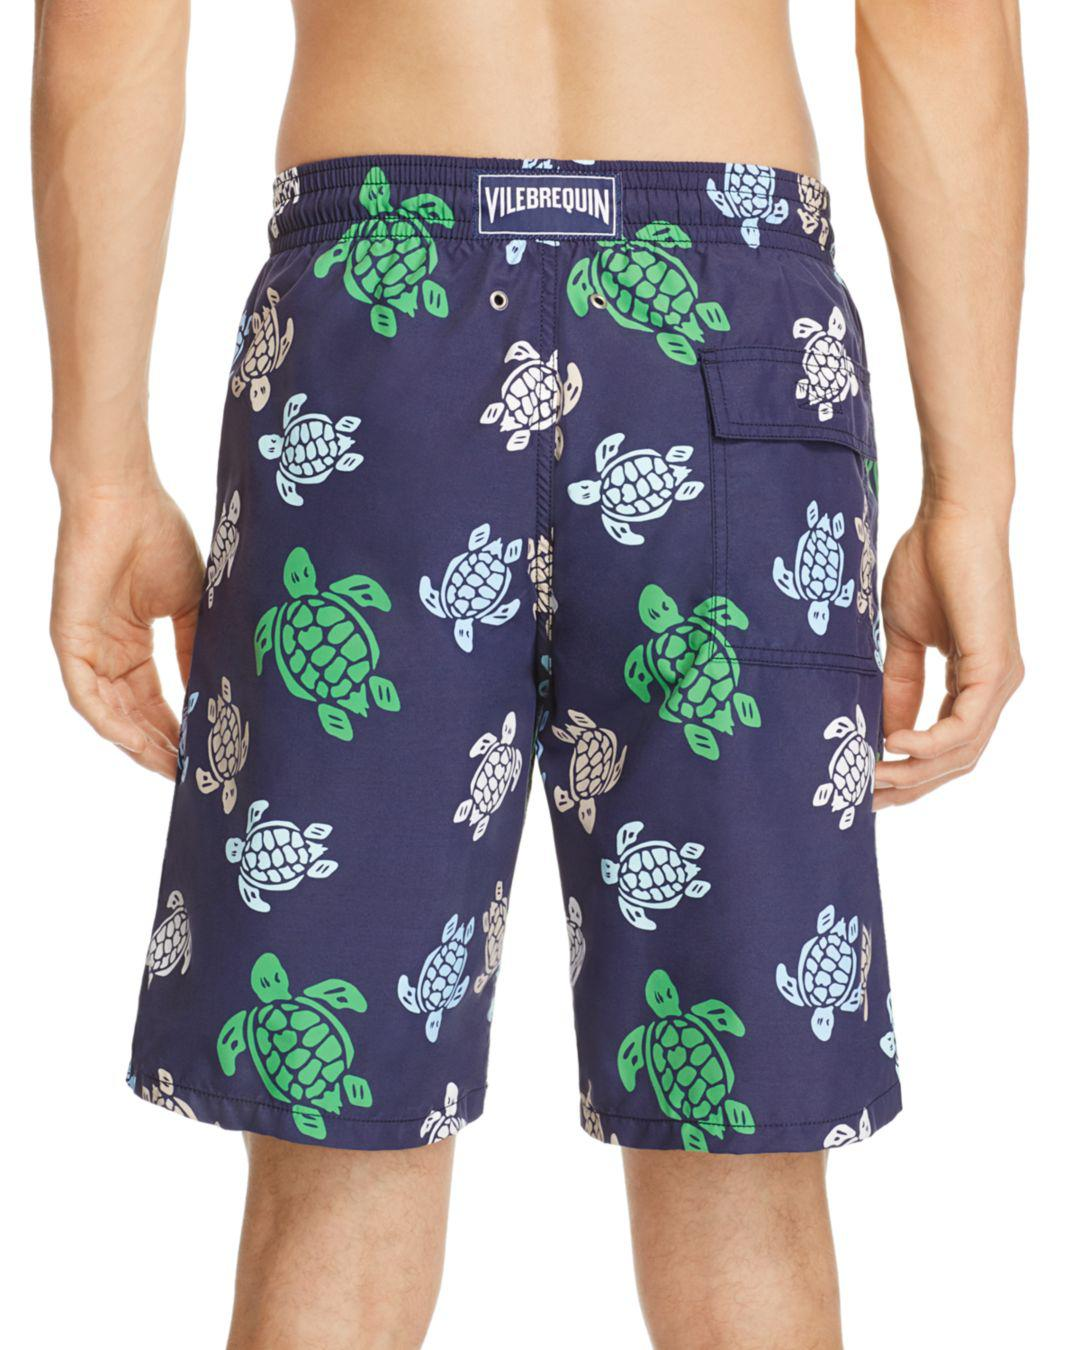 7256ca2127 Vilebrequin Okua Multicolored Turtle-print Swim Trunks in Blue for Men -  Lyst